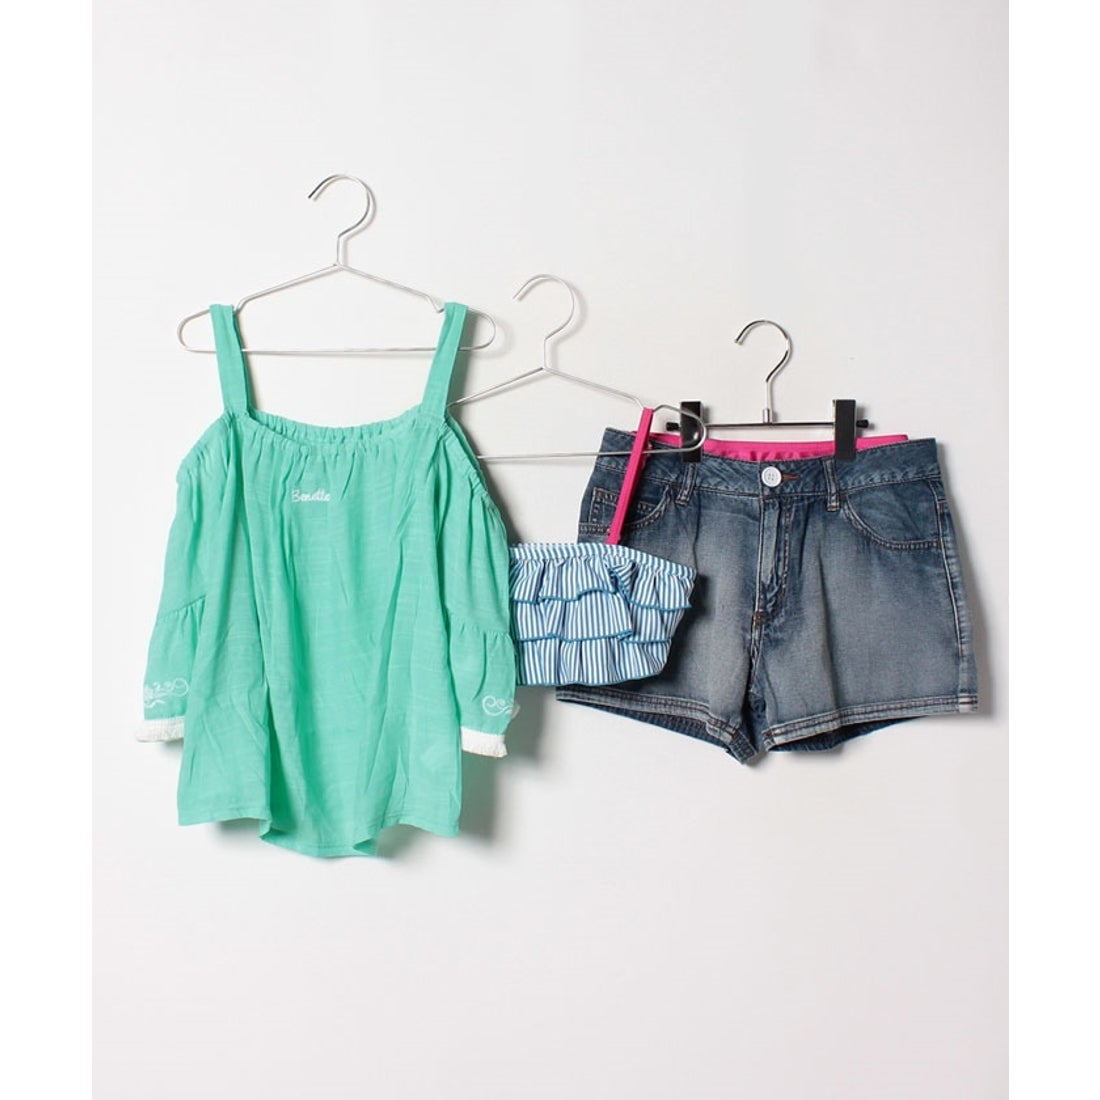 VacaSta Swimwear(Kids) BENETTONオフショルダーデザイン4点セット(ミント)【返品不可商品】